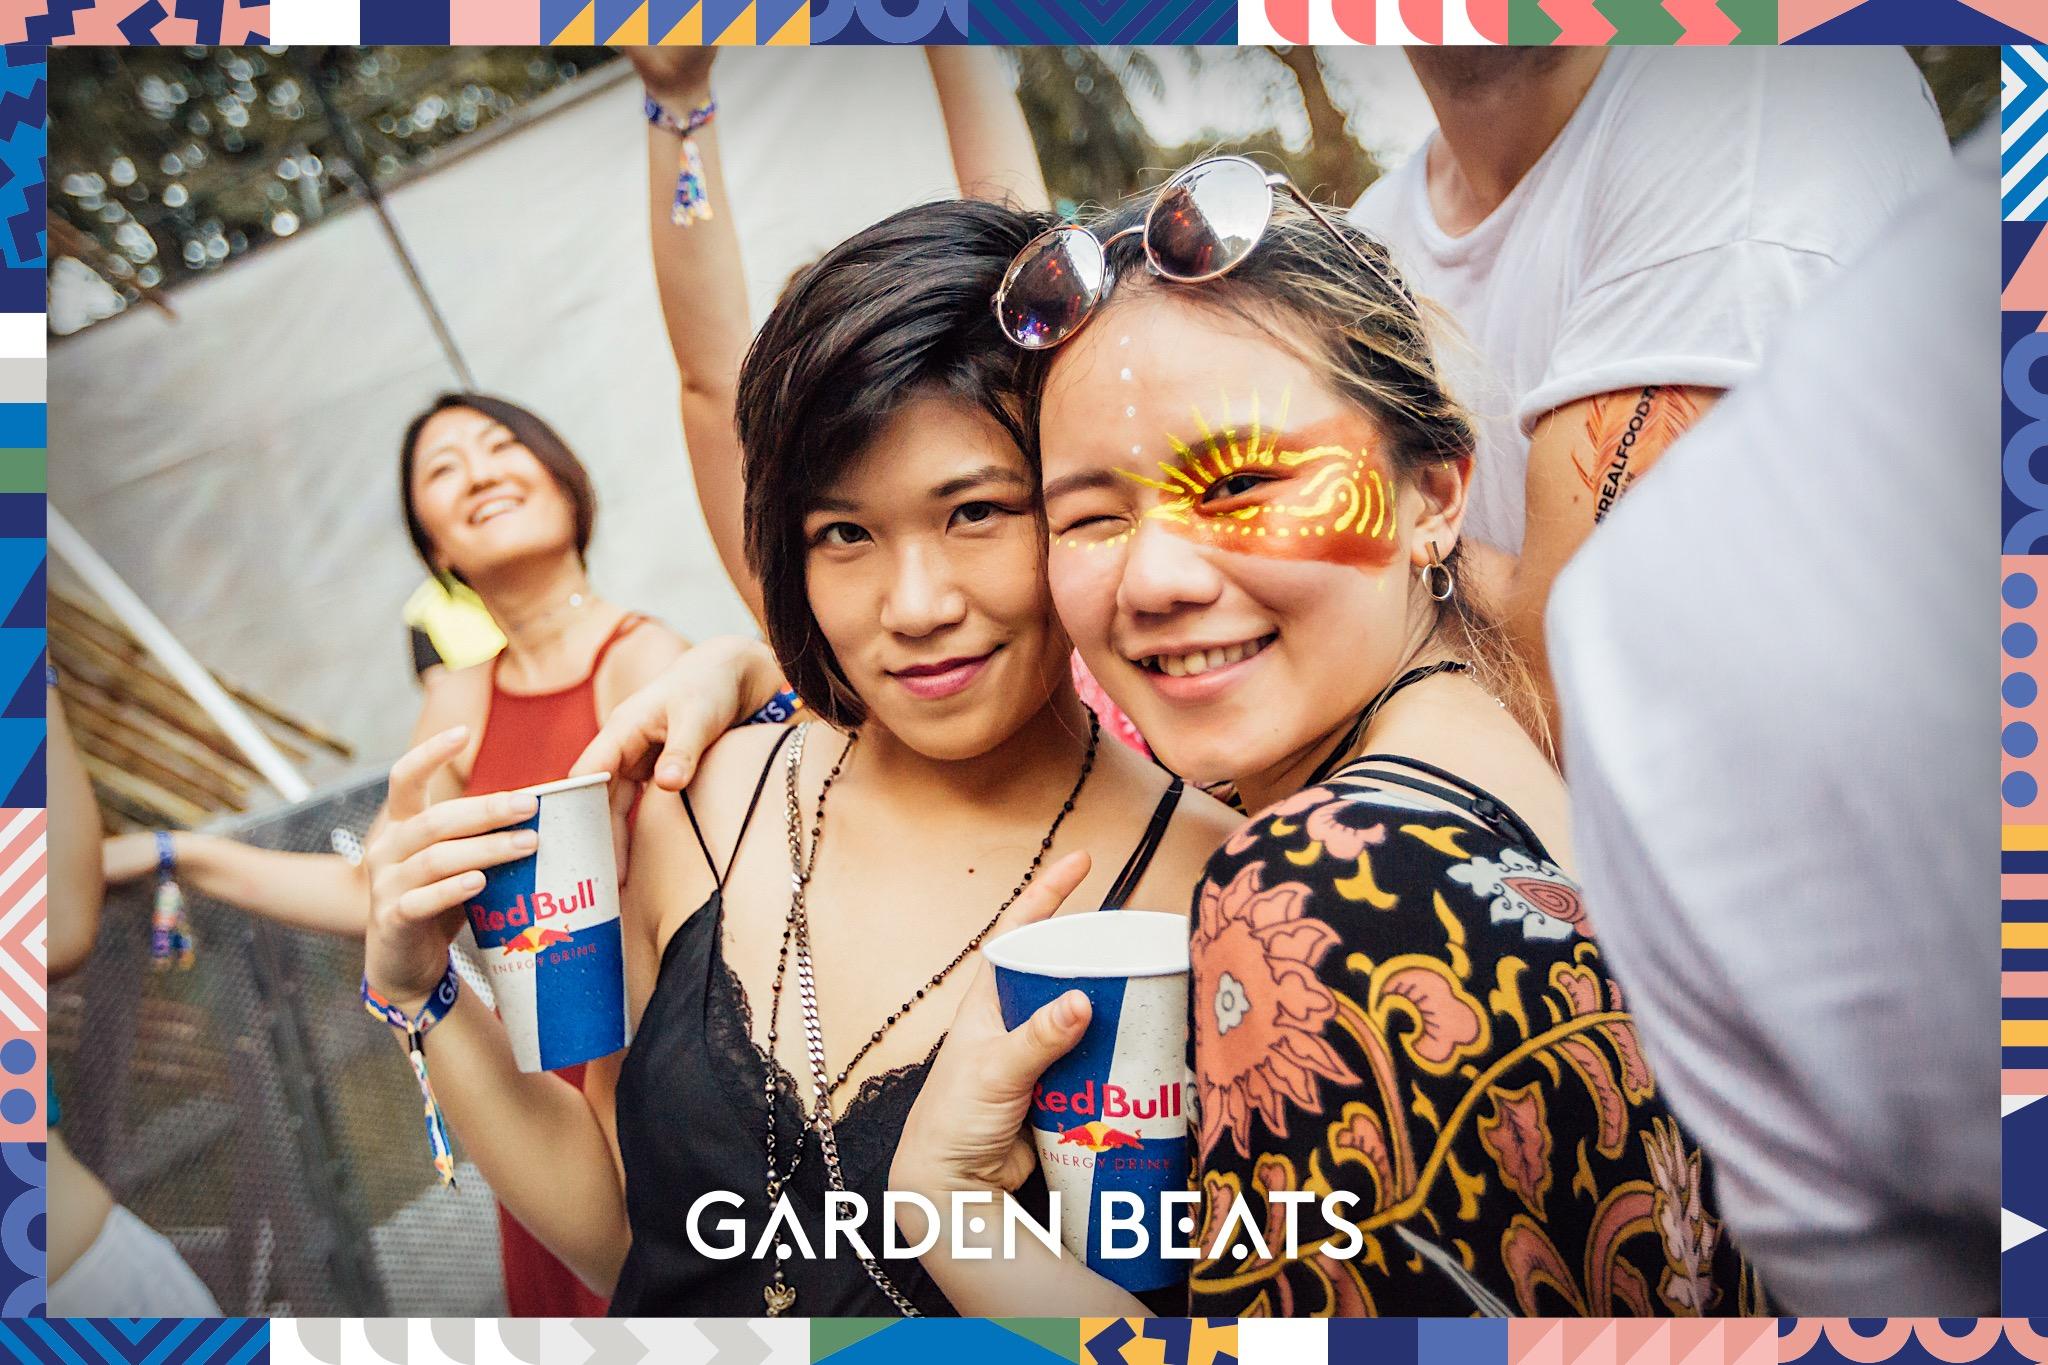 18032017_GardenBeats_Colossal681_WatermarkedGB.jpg